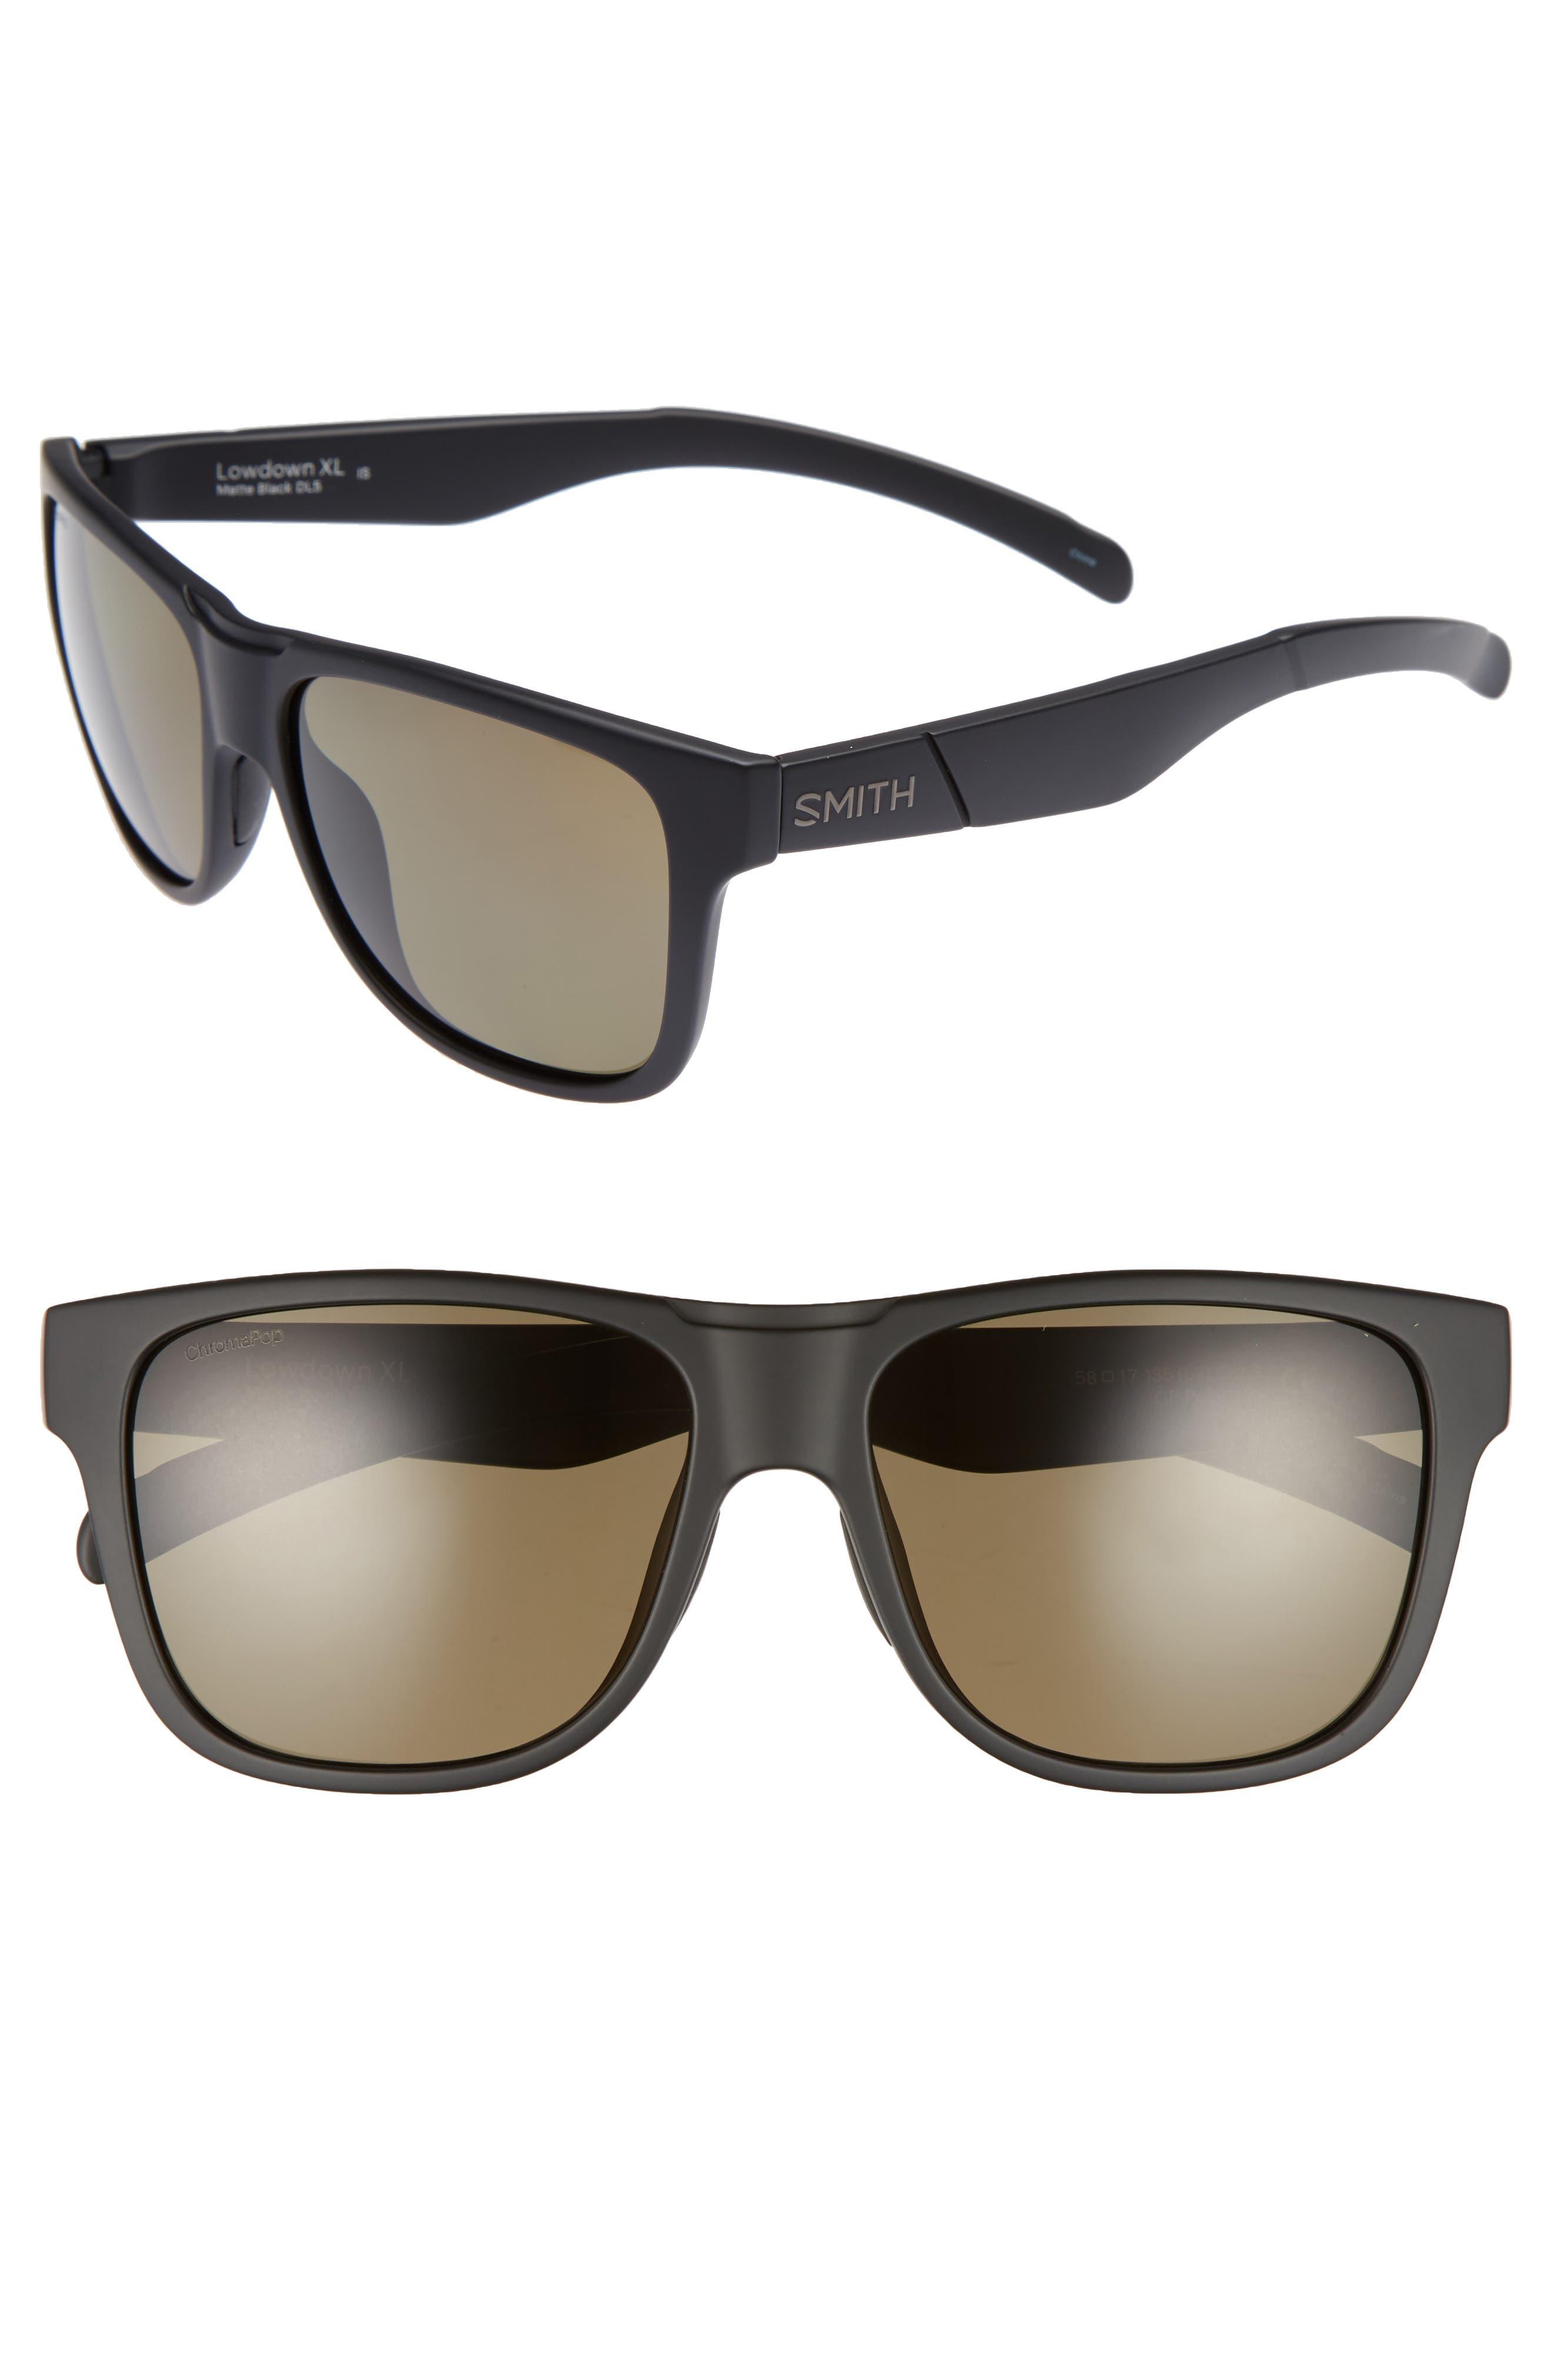 Lowdown XL 58mm Polarized Sunglasses,                         Main,                         color, 001